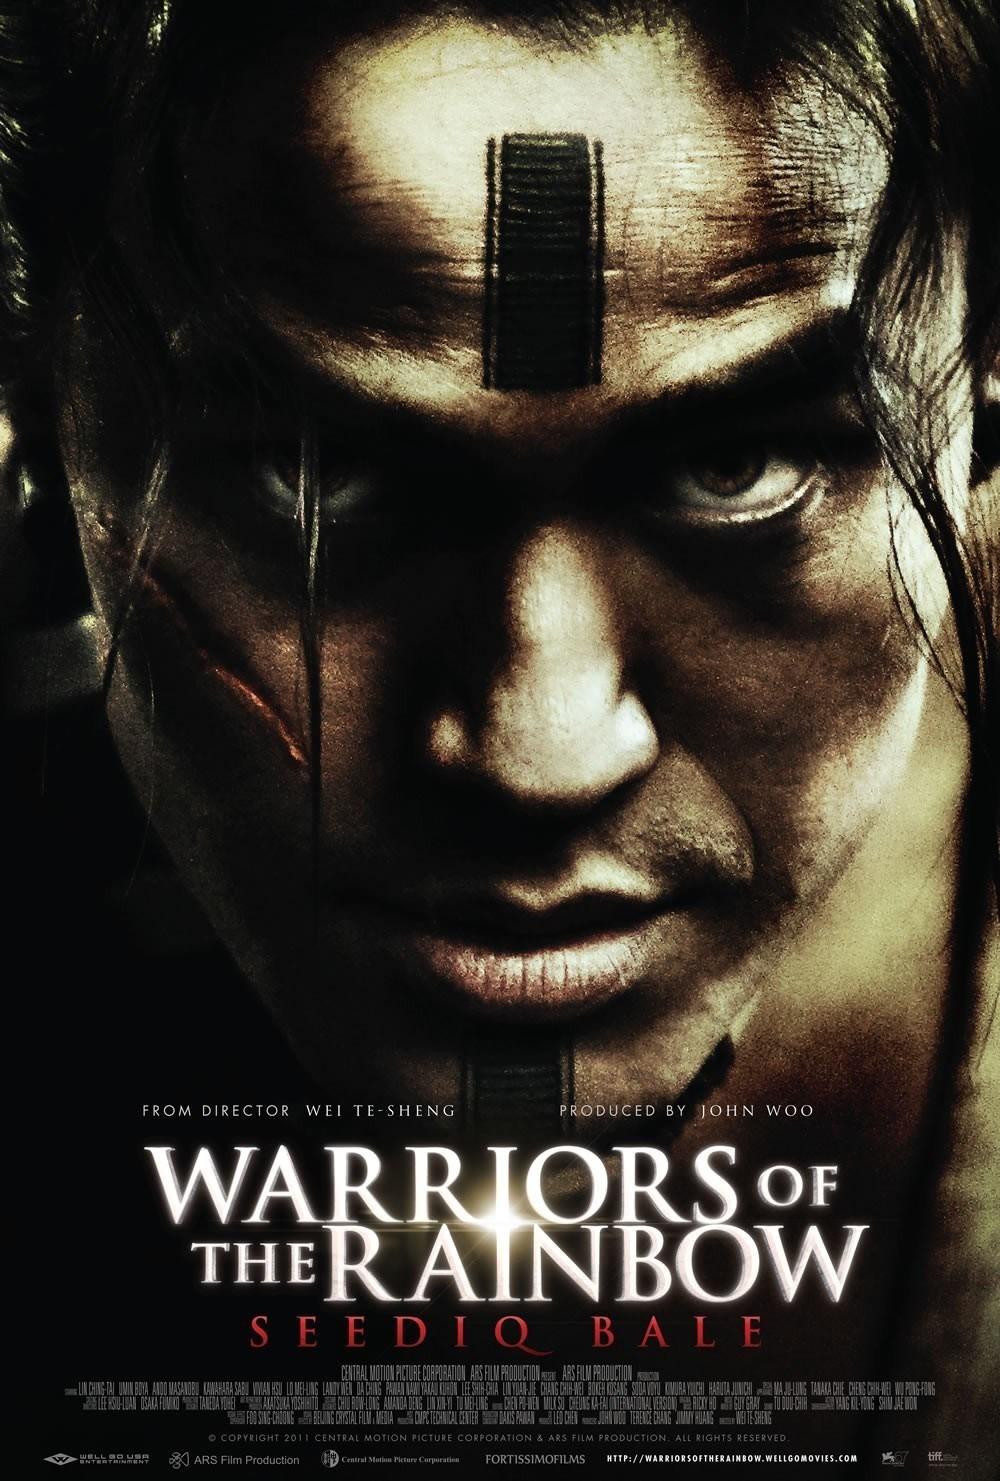 Warriors of the Rainbow Seediq Bale Part 1